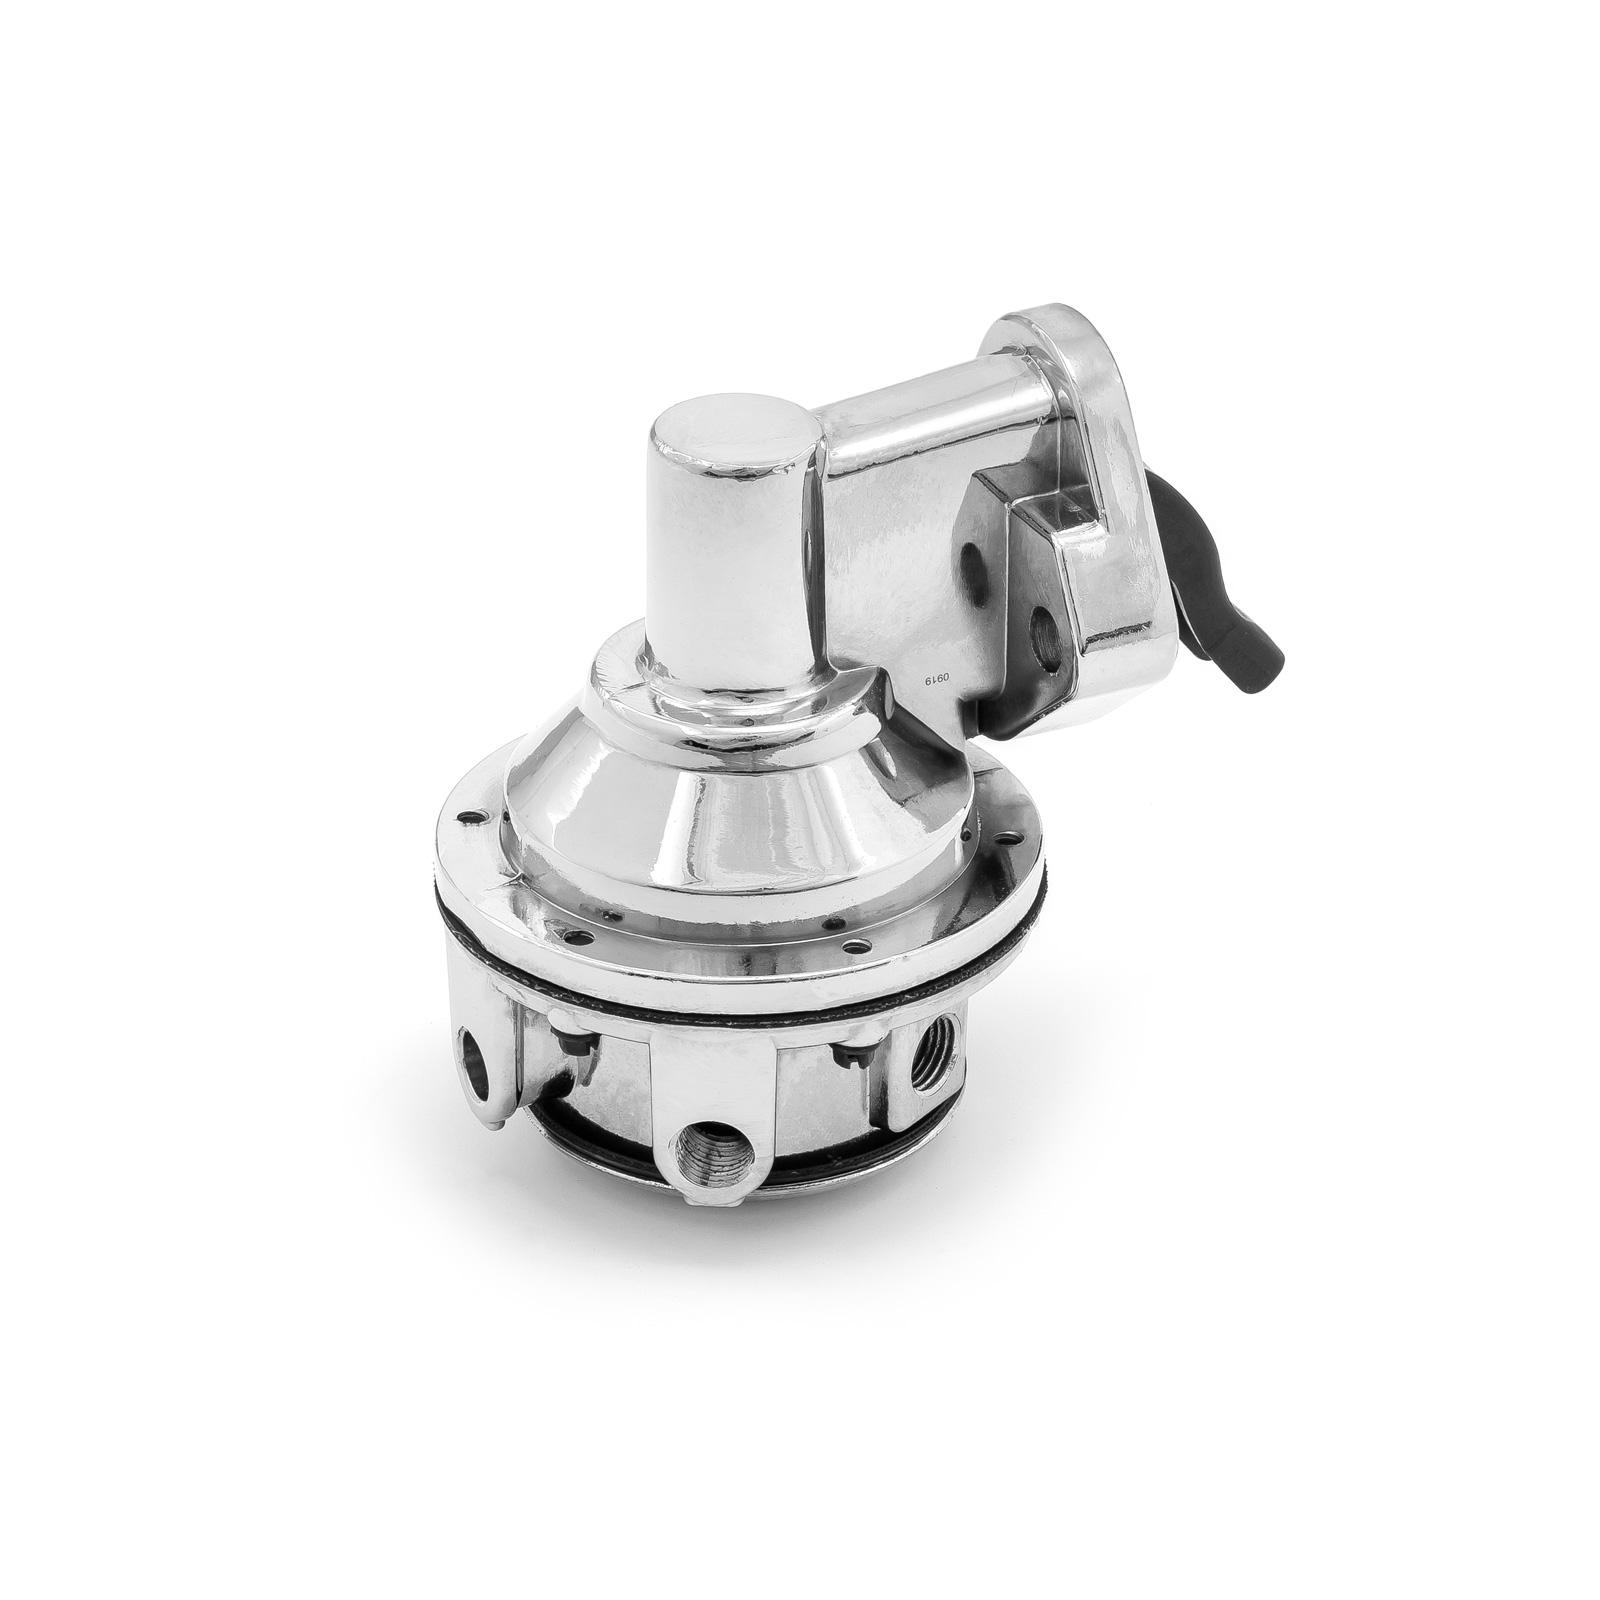 "Chevy SBC 350 High Volume Mechanical Fuel Pump Chrome 1/4"" Fitting"